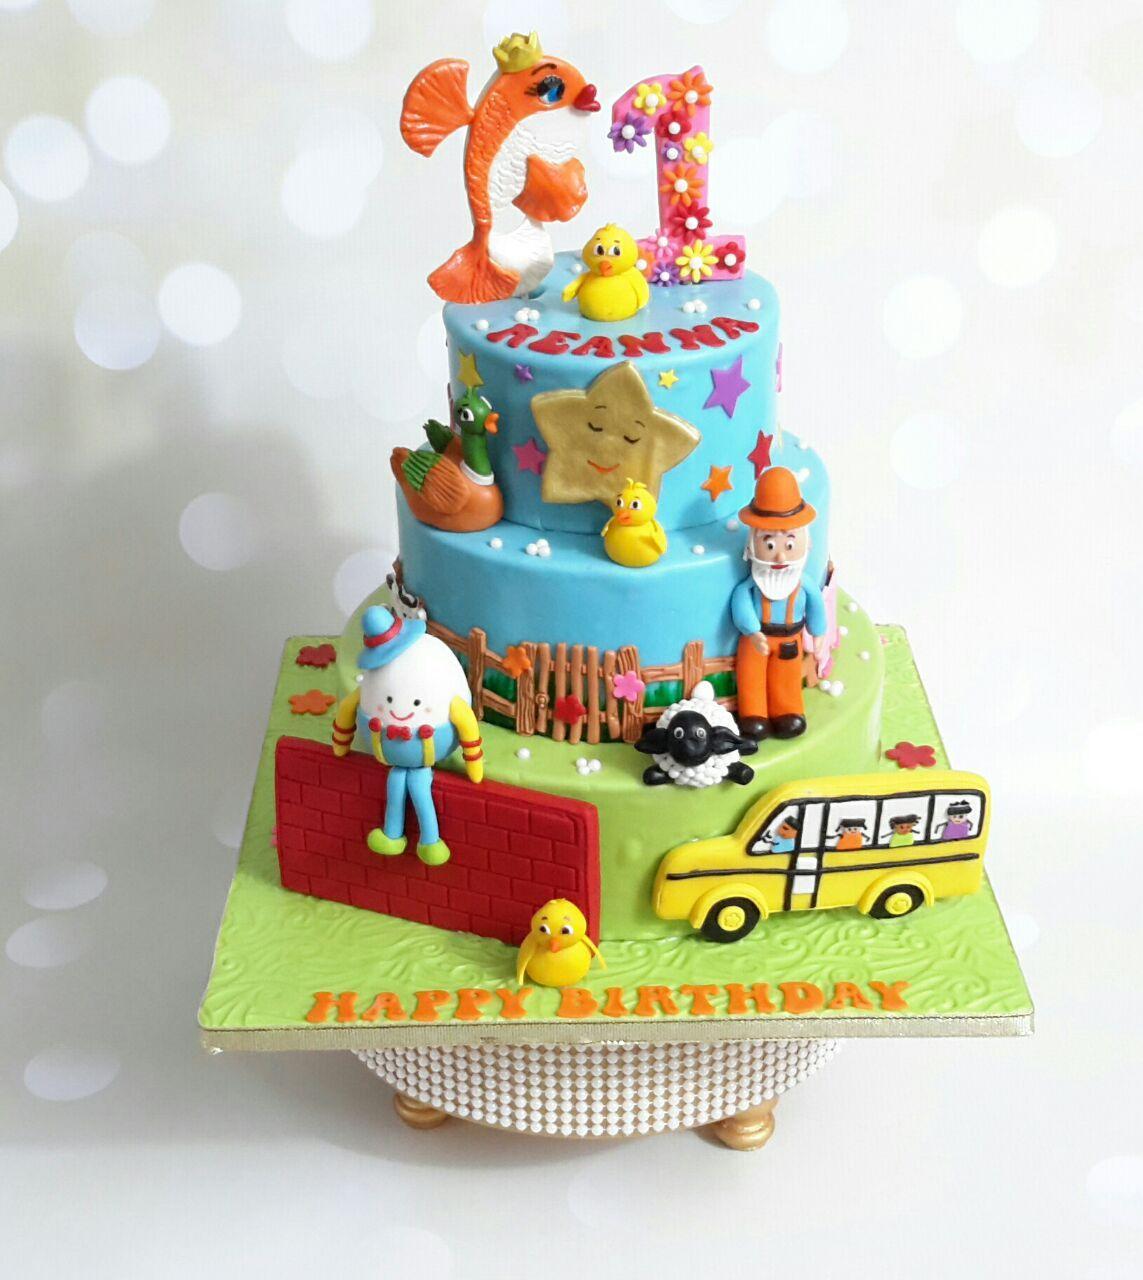 Nursery Rhyme Theme Cake Designed As Per The 5 Rhymes We